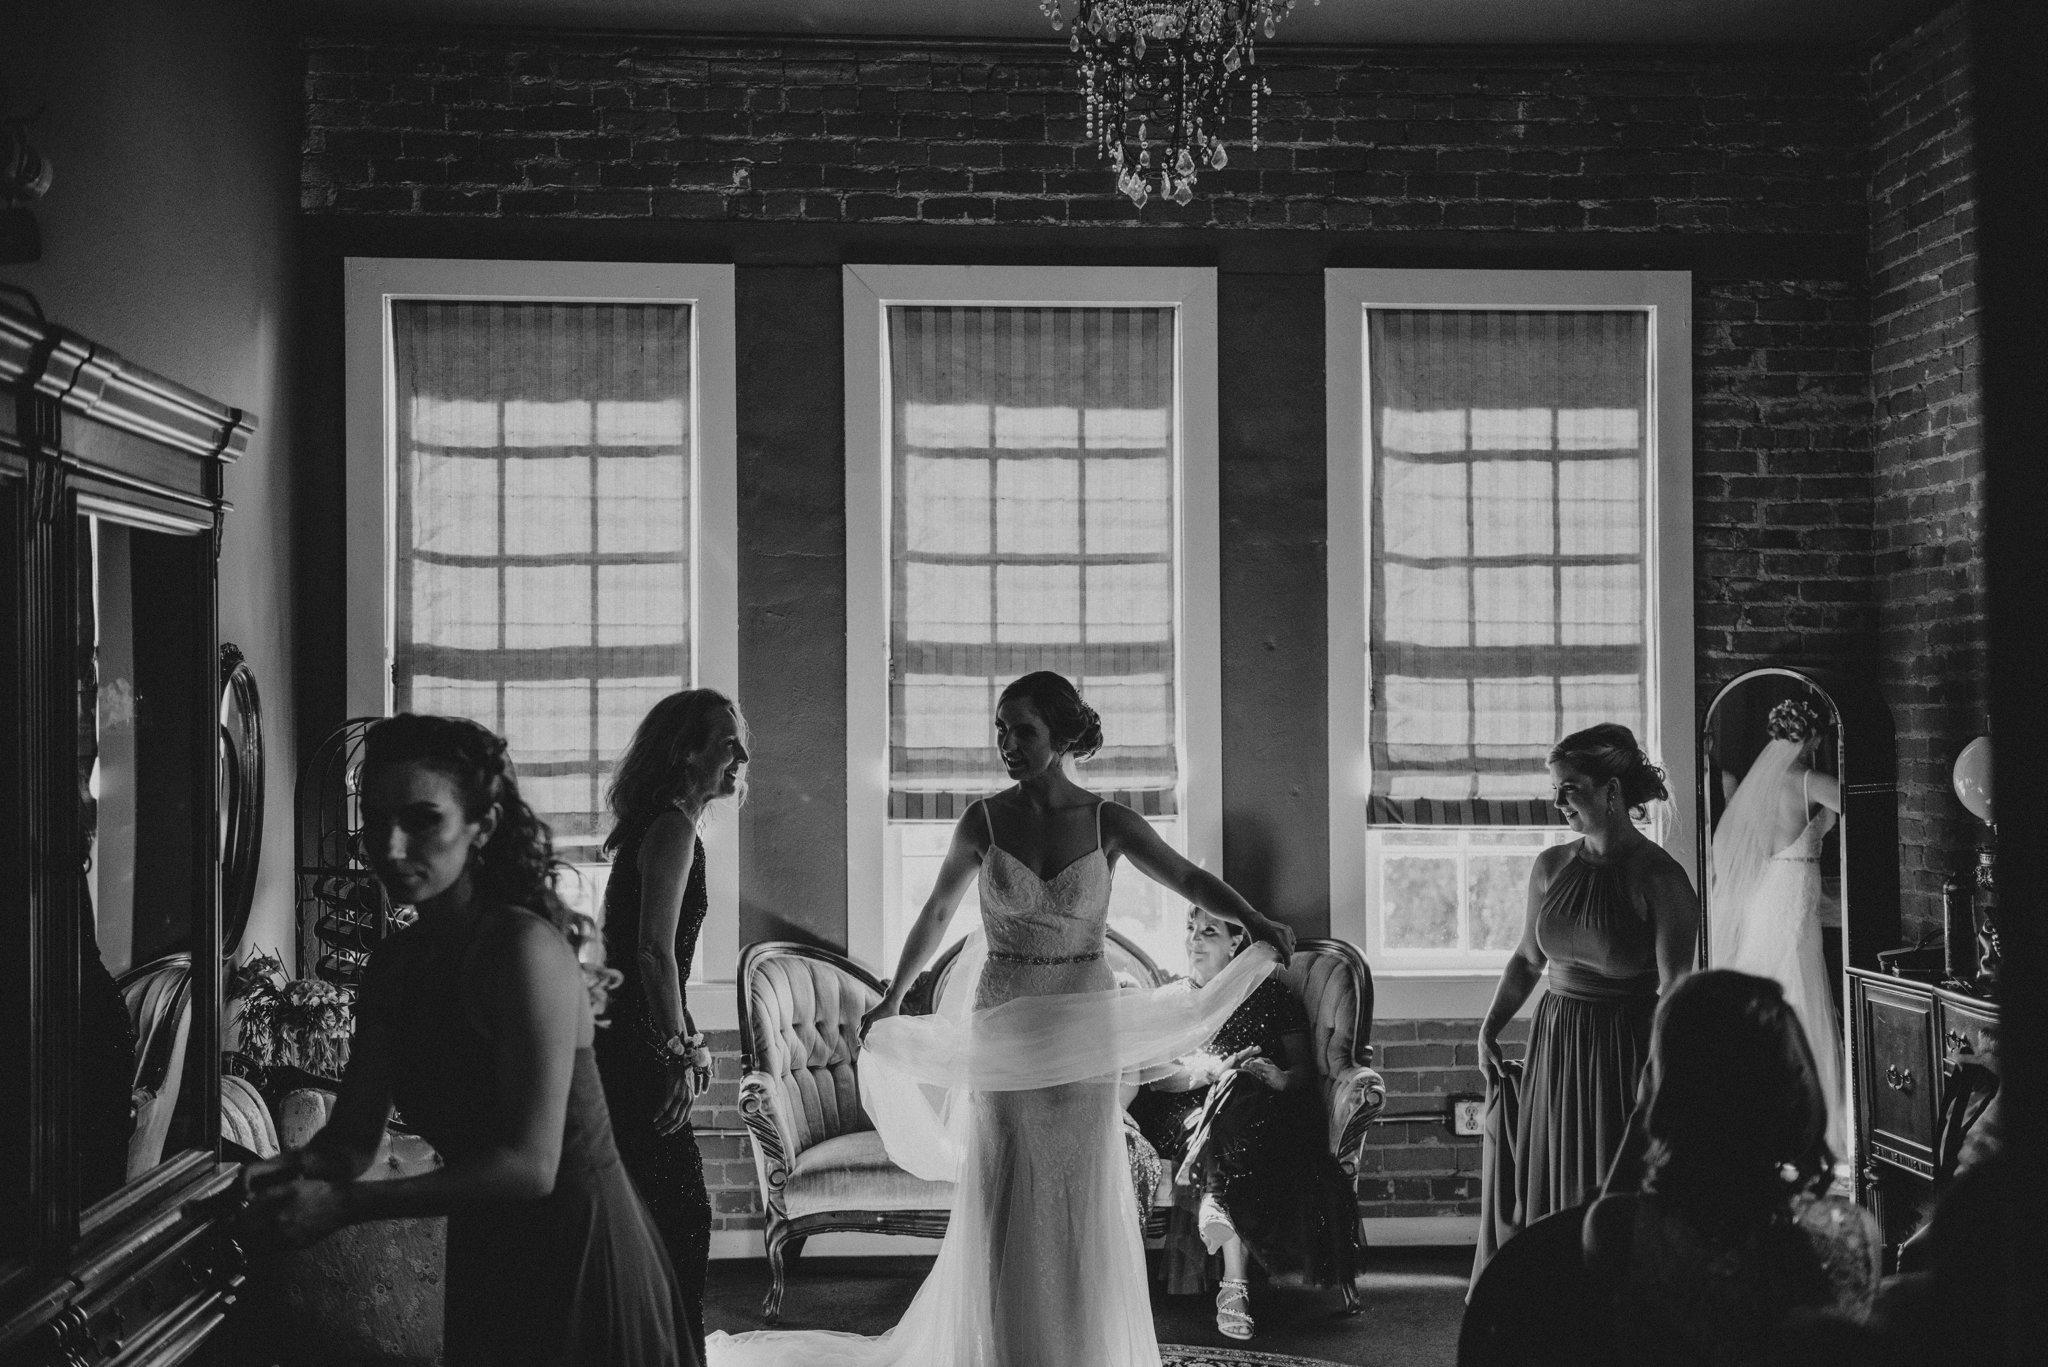 hollywood-school-house-wedding-seattle-photographer-caitlyn-nikula-62.jpg